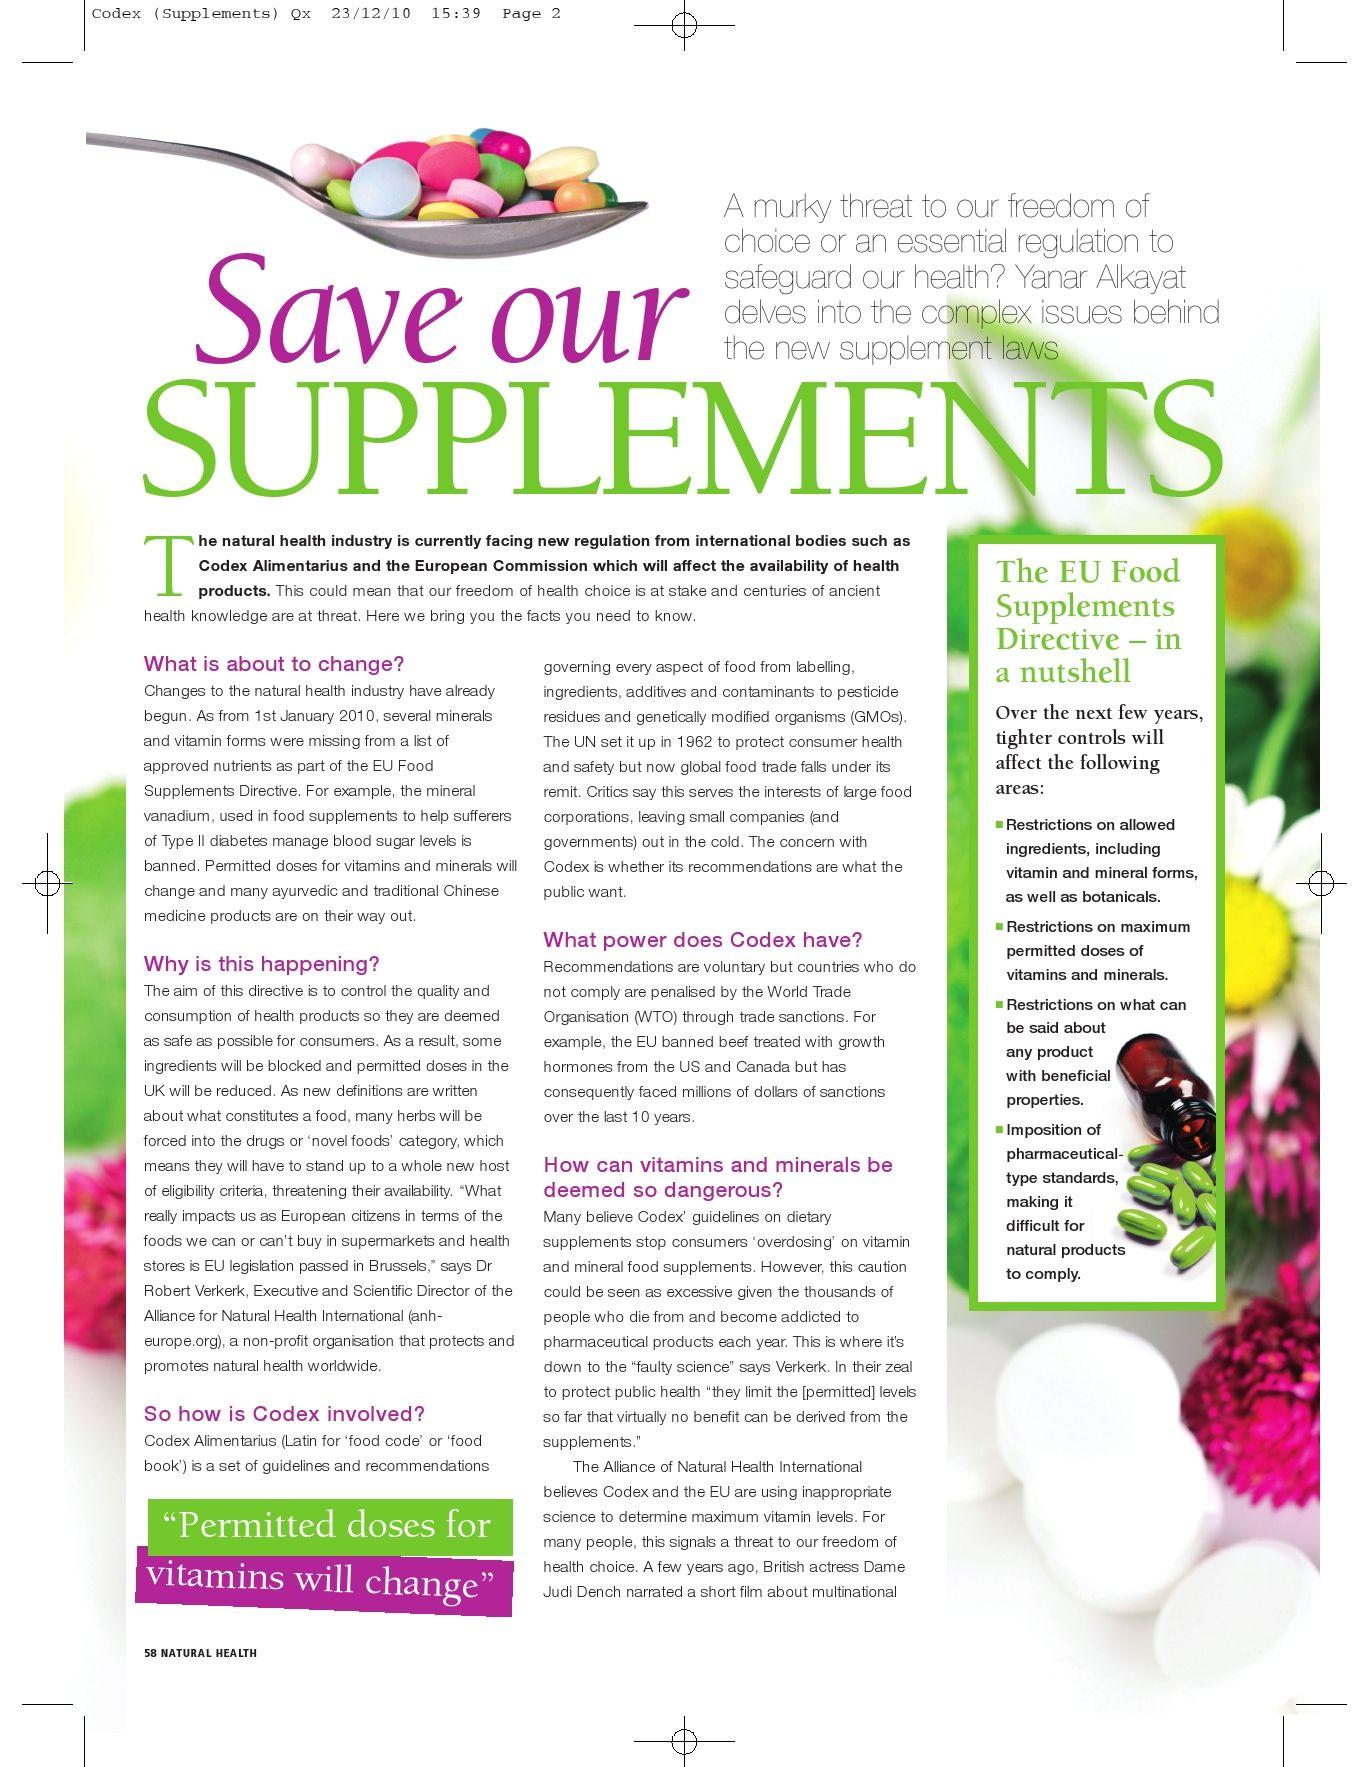 Health magazine articles